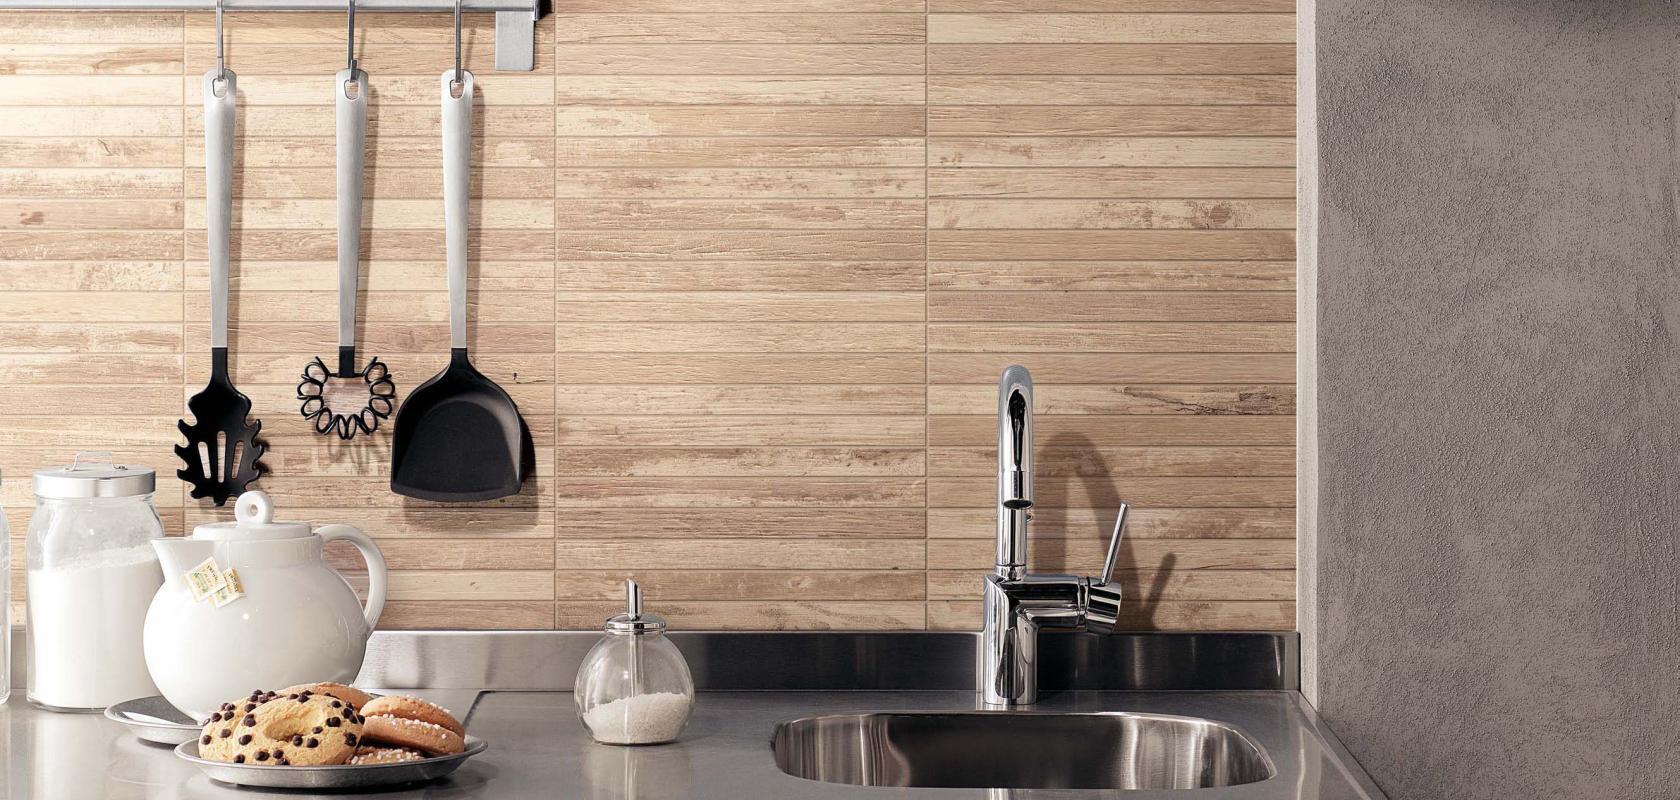 Emejing Piastrelle Per Cucina Classica Photos - Home Interior Ideas ...